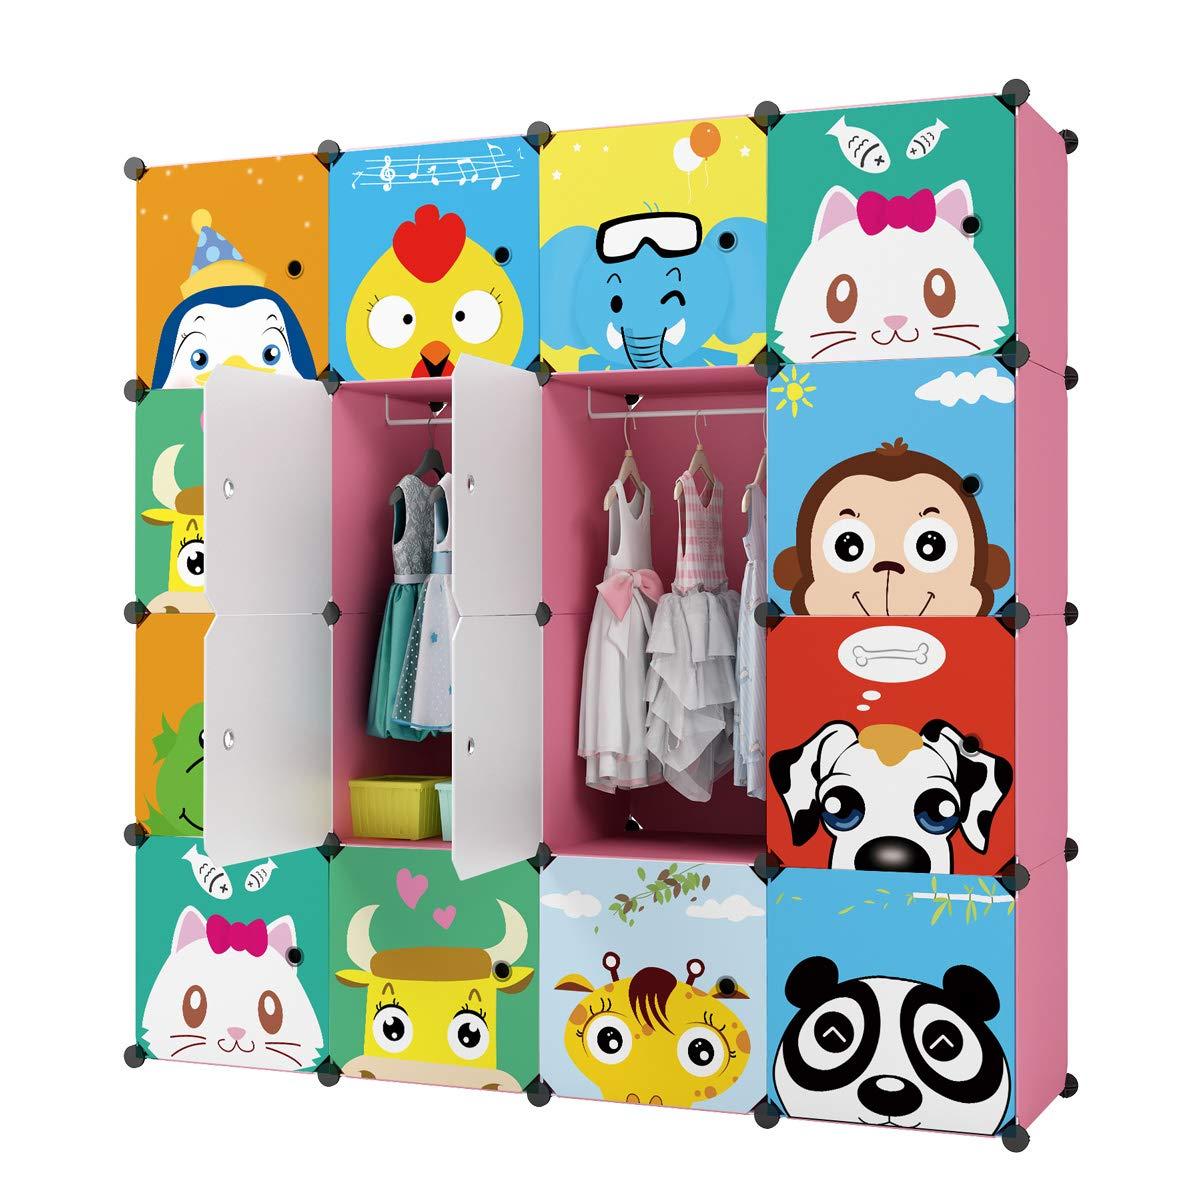 KOUSI Portable Kids Wardrobe Closet Children Dresser Hanging Storage Rack Clothes Closet Bedroom Armoire Cube Organizer Formaldehyde-Free Furniture (Pink, 12 Cubes & 2 Hanging Sections) by KOUSI